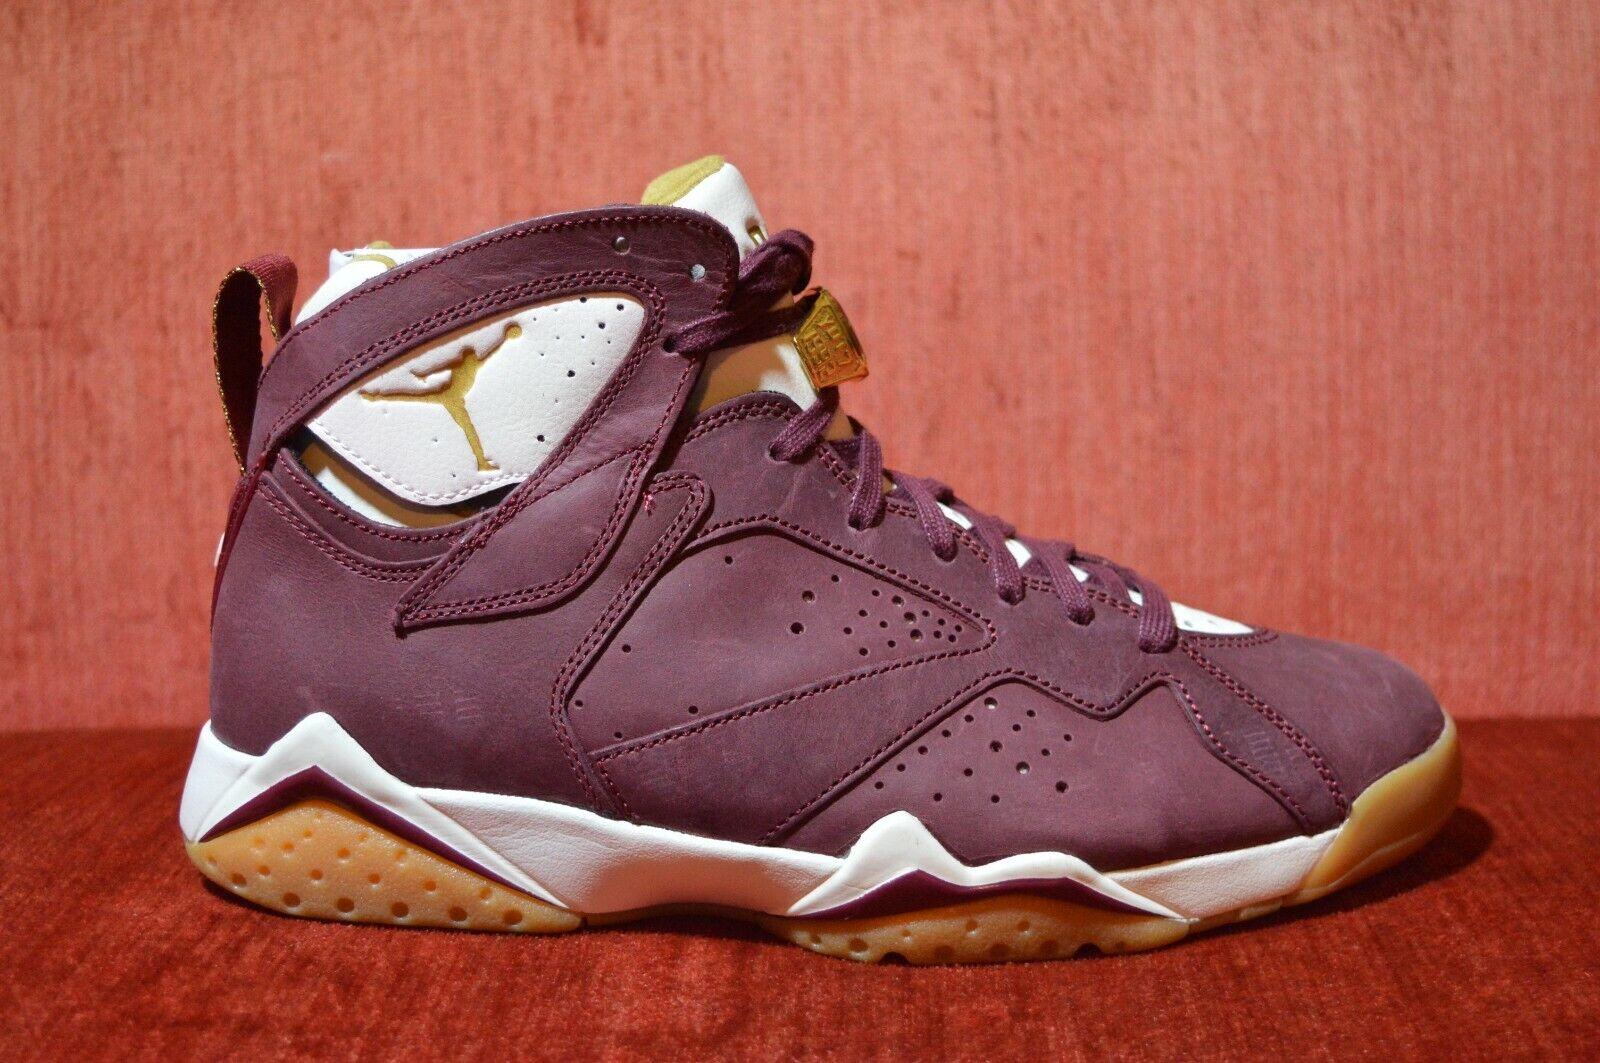 super popular 9c1a6 dc48e WORN ONCE Nike Air Jordan 7 Cigar C C Size 9 9 9 725093 630 Red Gum